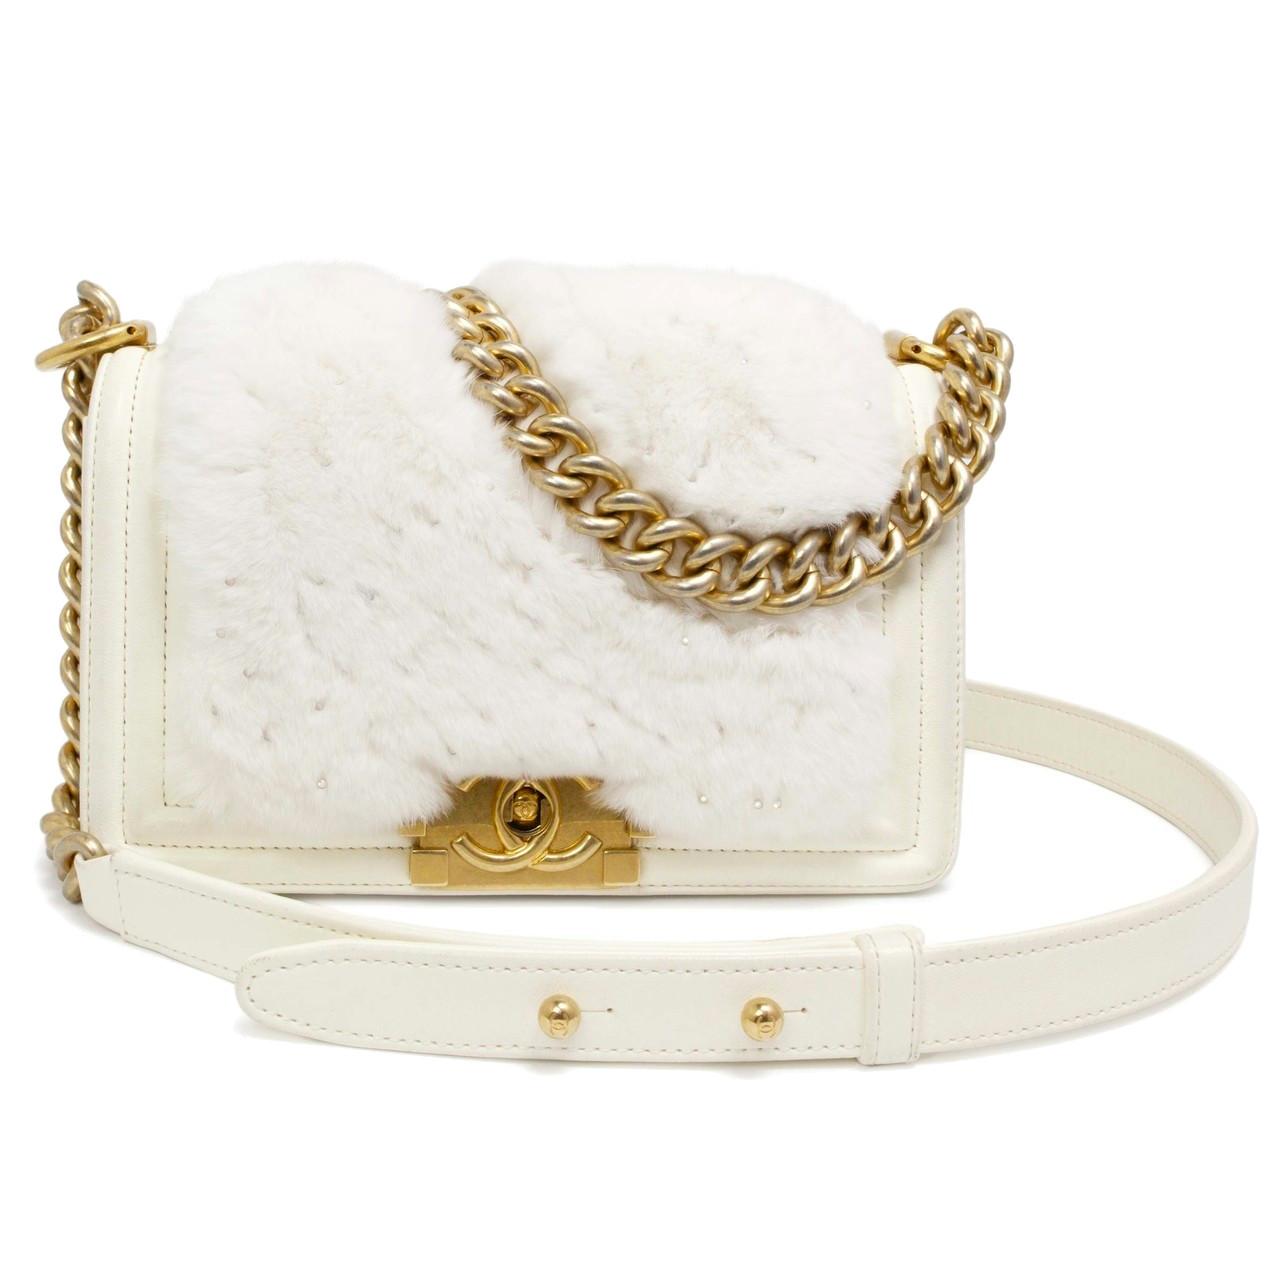 490c4982b9e5 Chanel White Lambskin & Rabbit Fur Small Boy Bag - modaselle